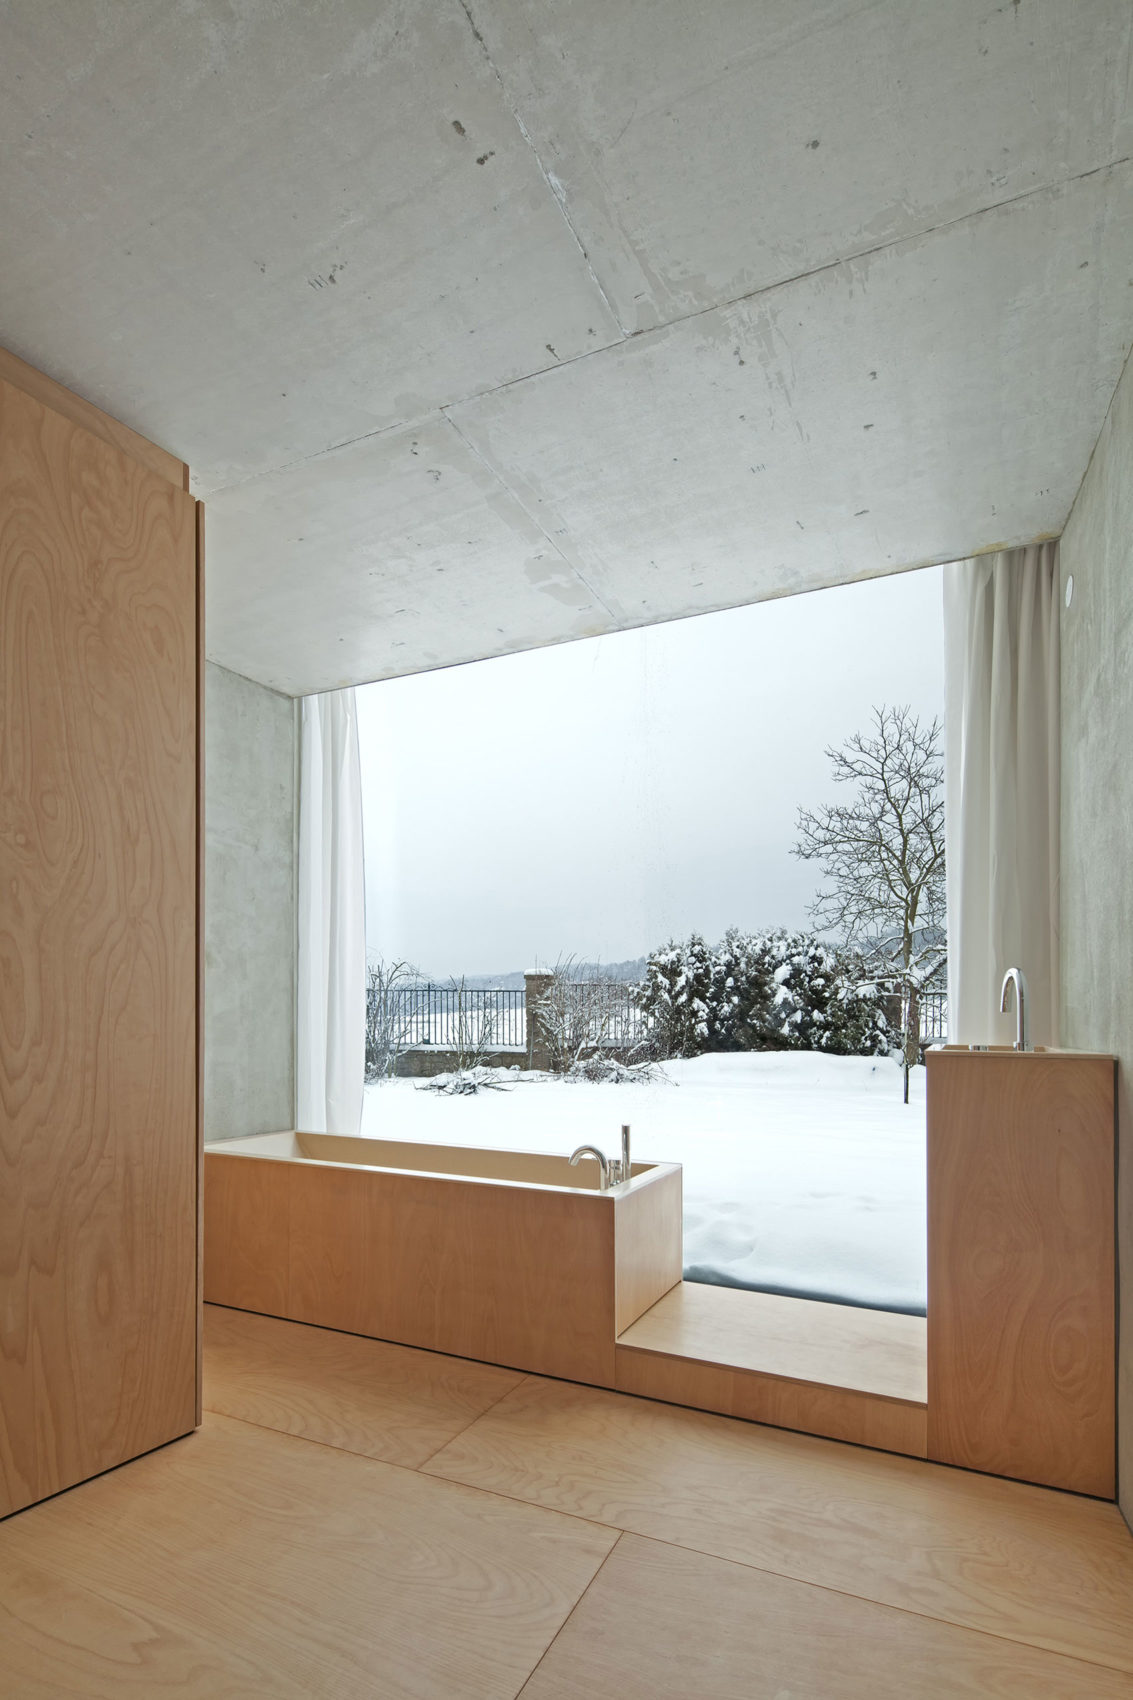 Chameleon House by Petr Hajek Architekti (3)